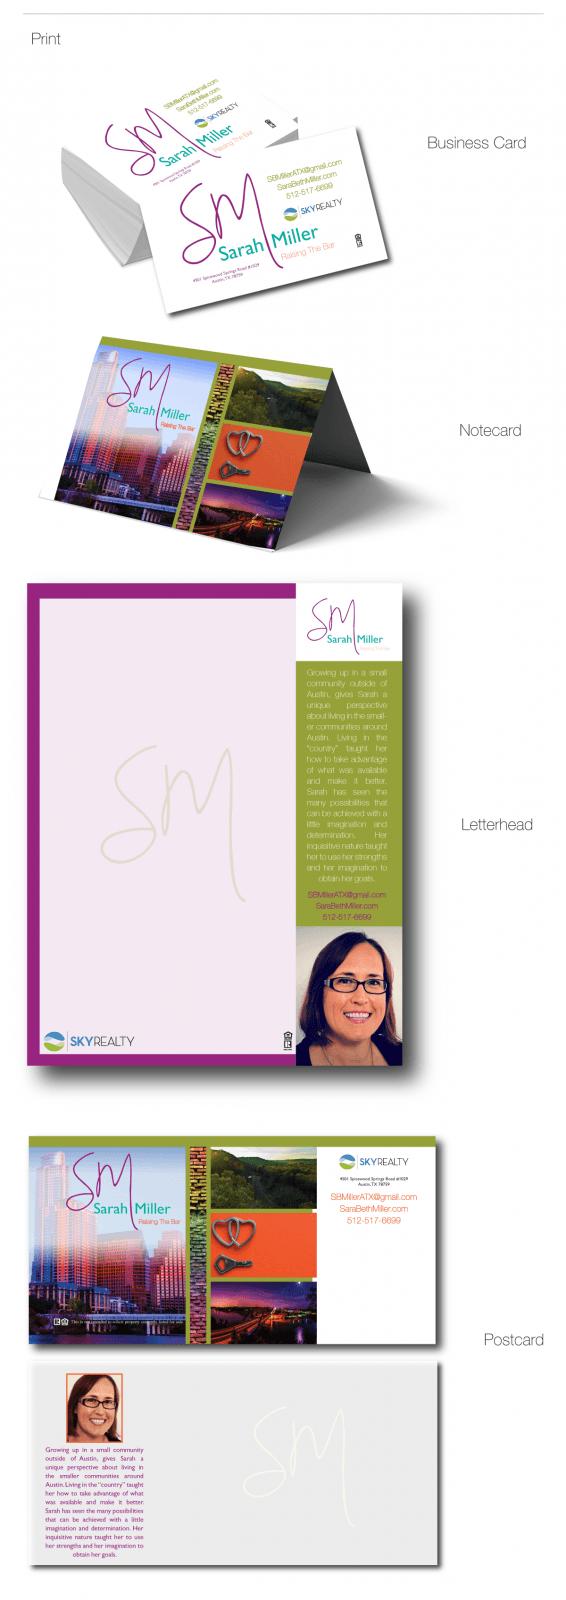 Design-Board-Web---Sarah-Miller_05